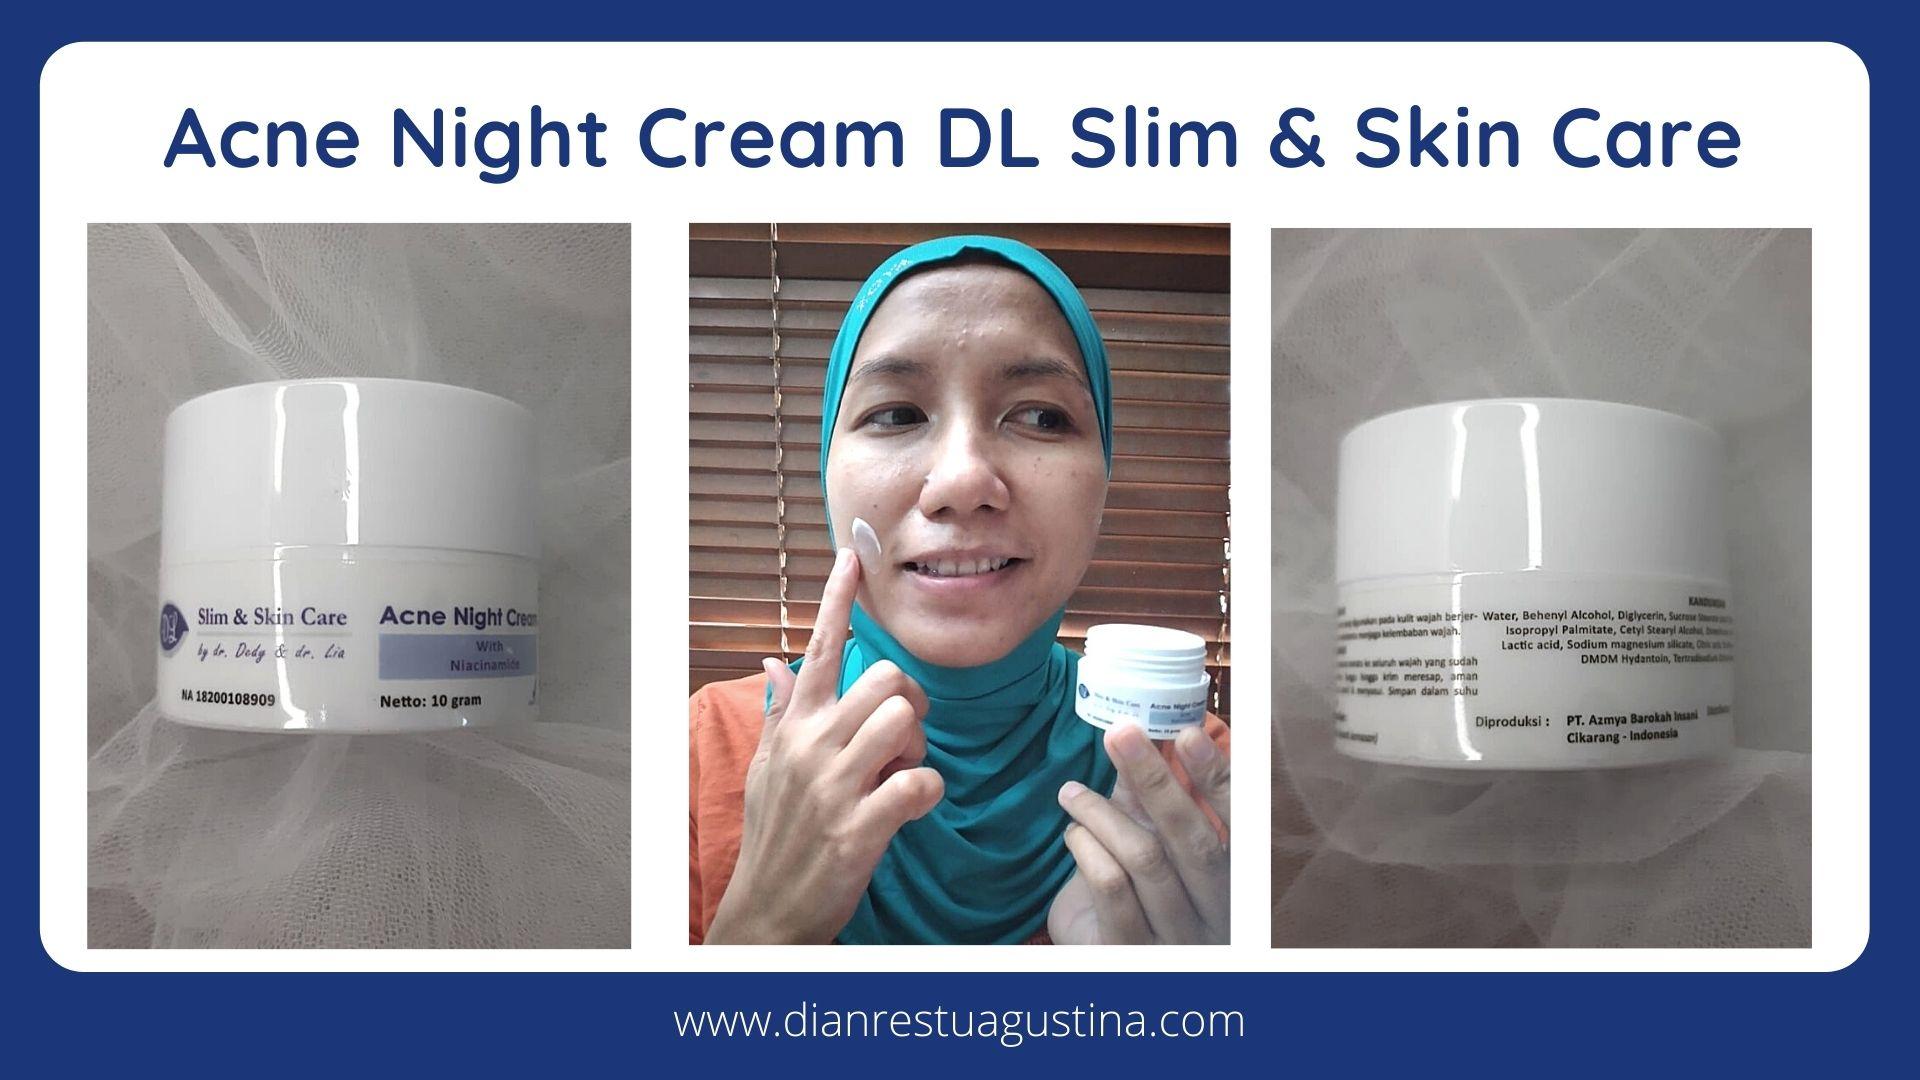 Acne Night Cream DL Slim & Skin Care